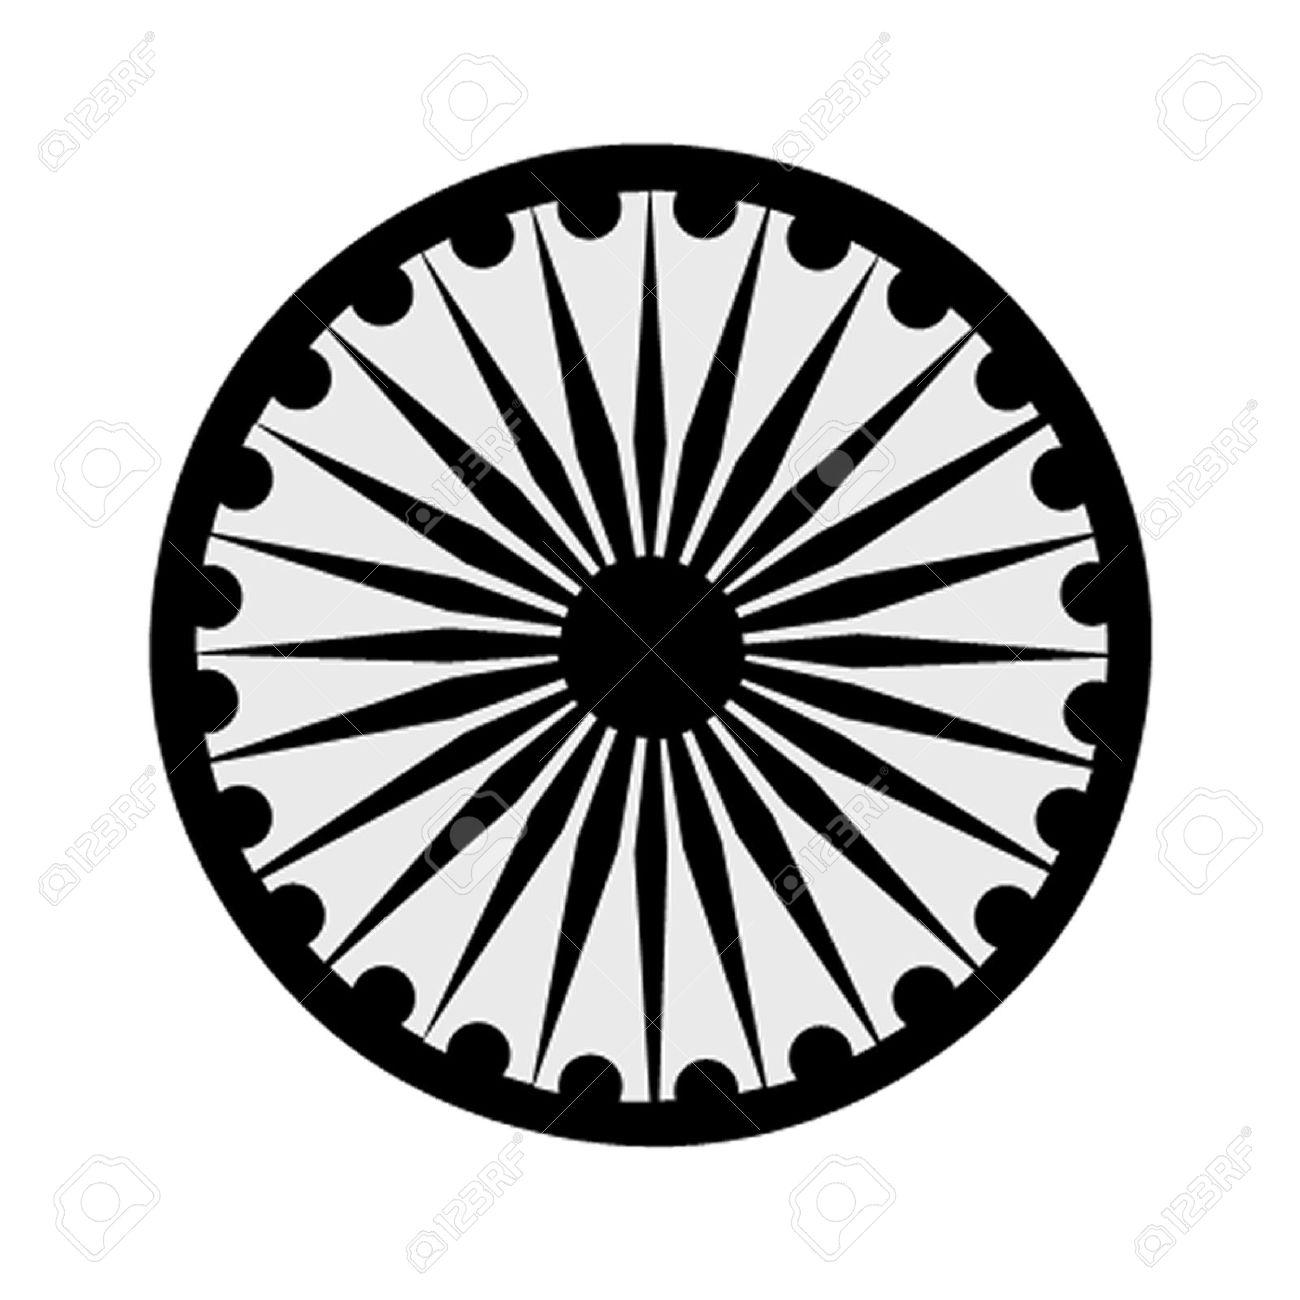 The buddhist symbol of the ashoka chakra royalty free cliparts the buddhist symbol of the ashoka chakra stock vector 25515236 biocorpaavc Images